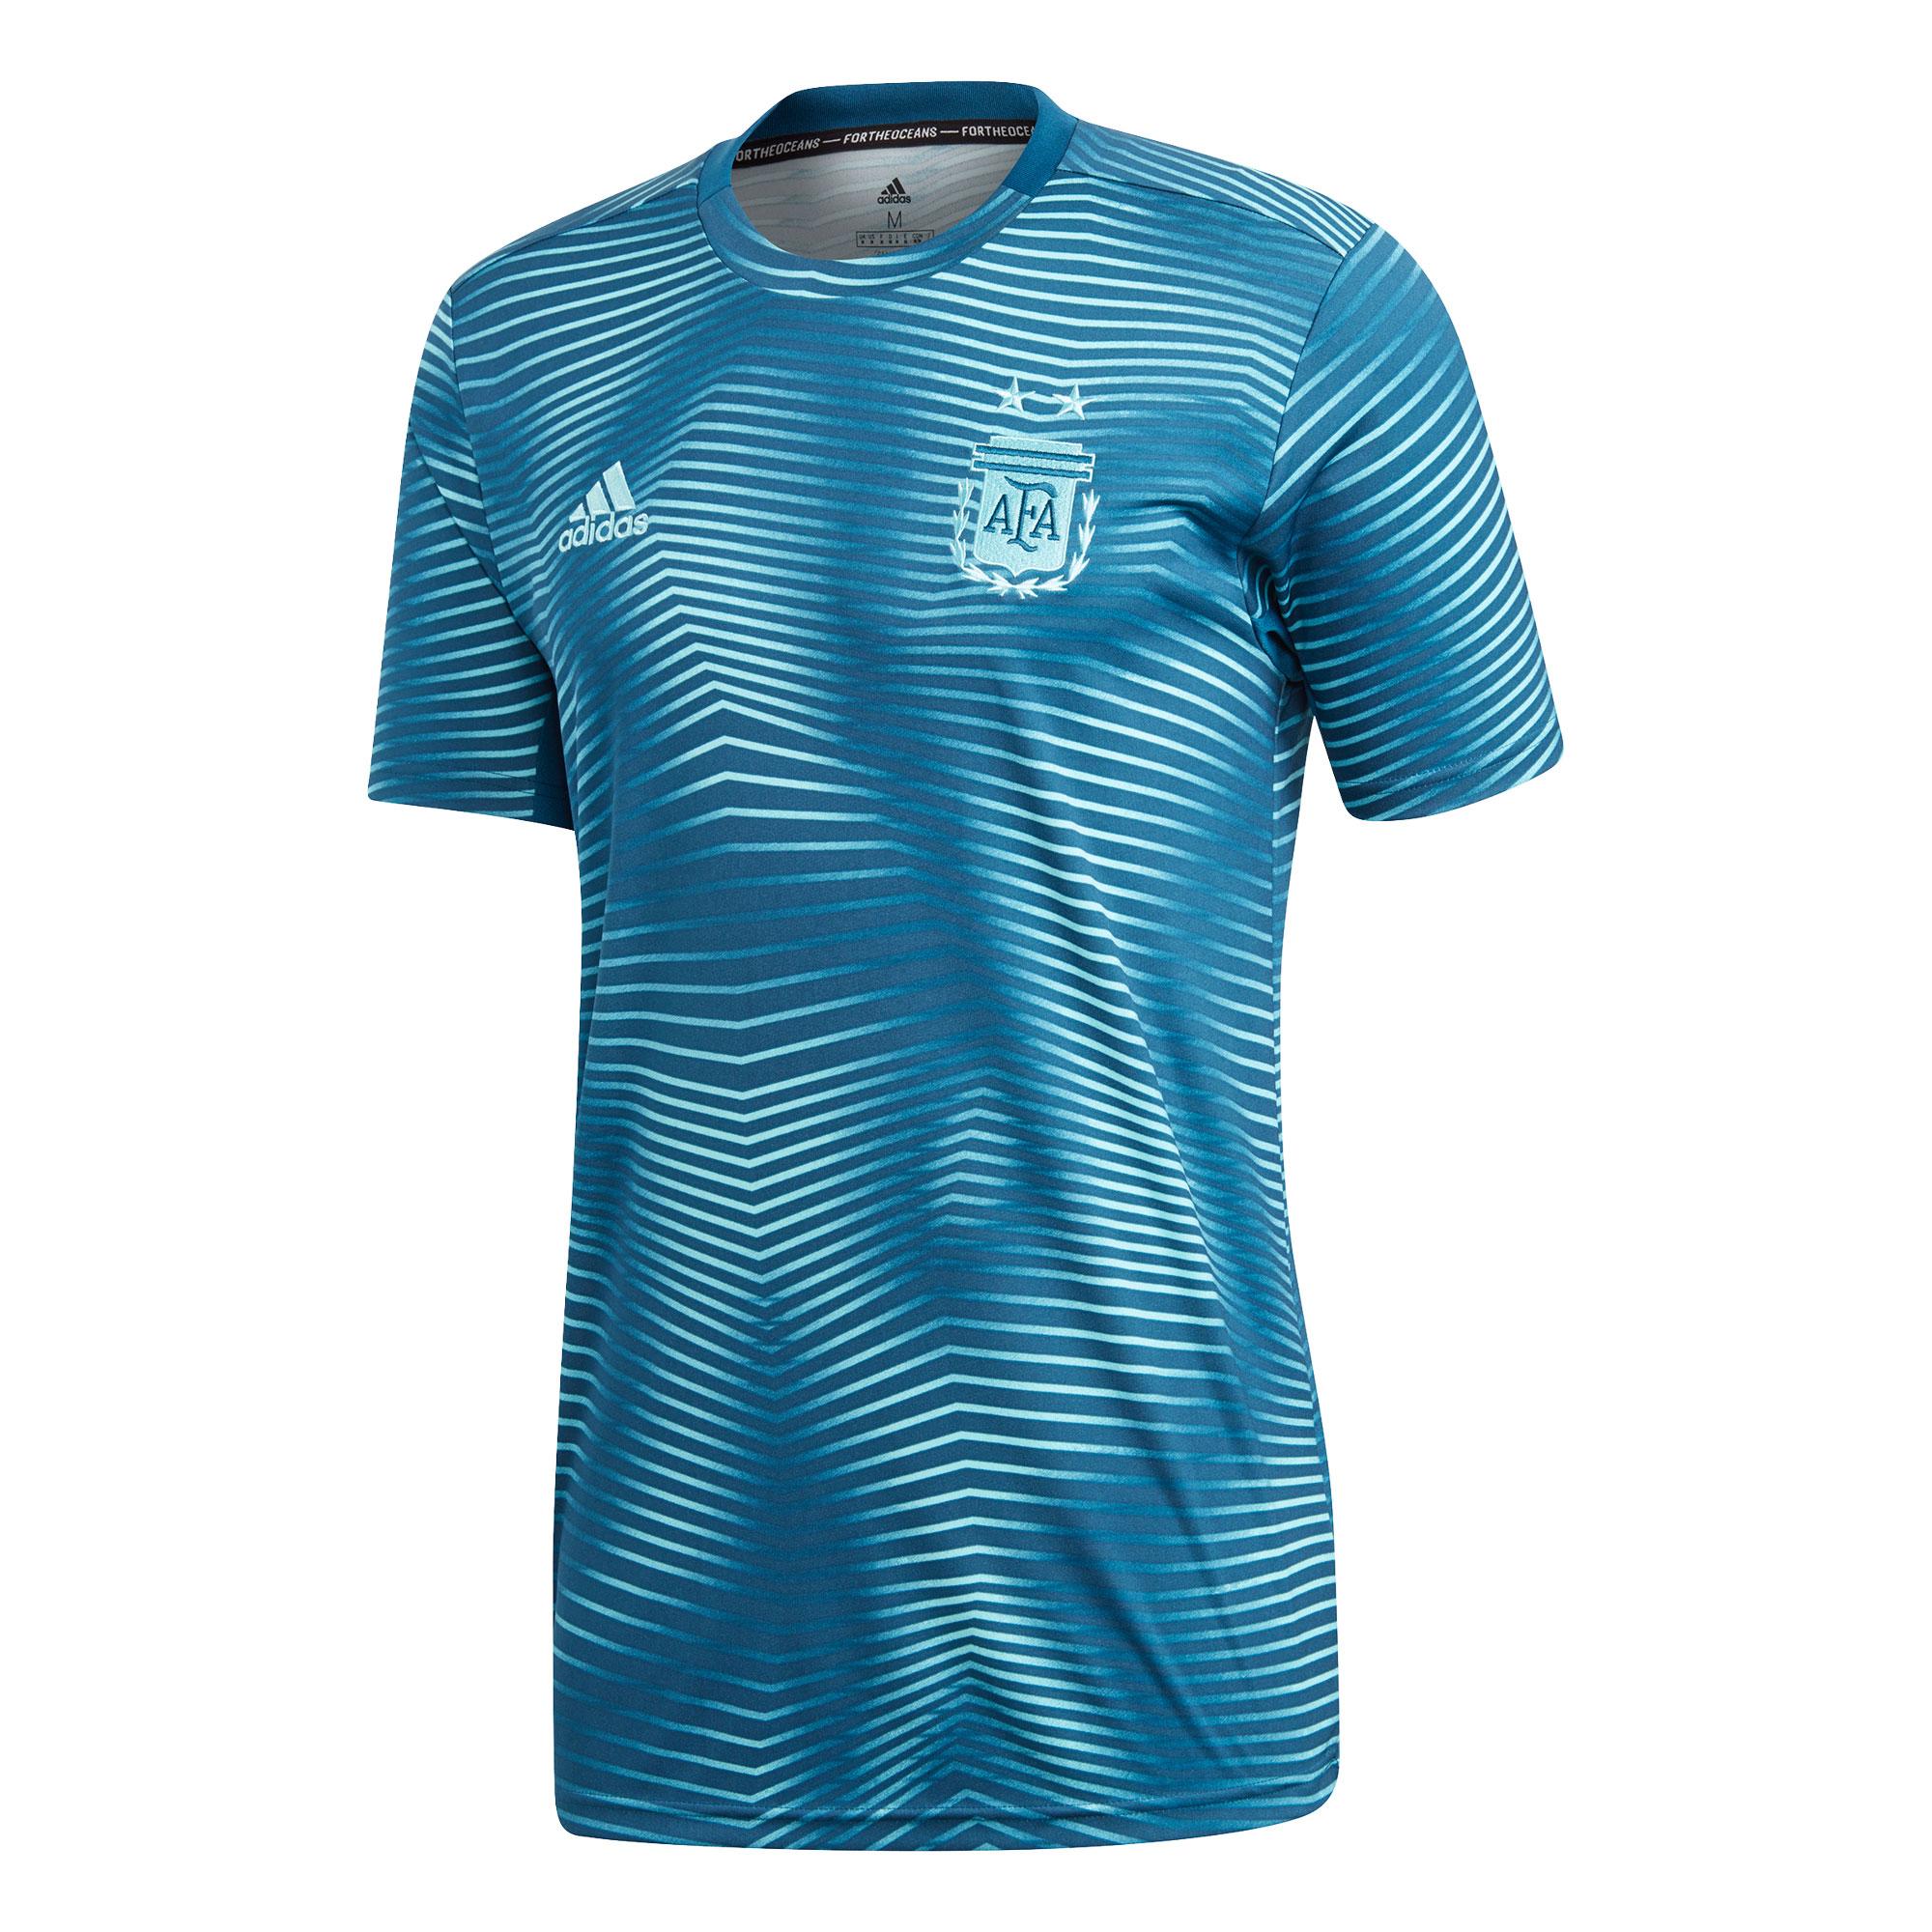 Argentina Home shirt